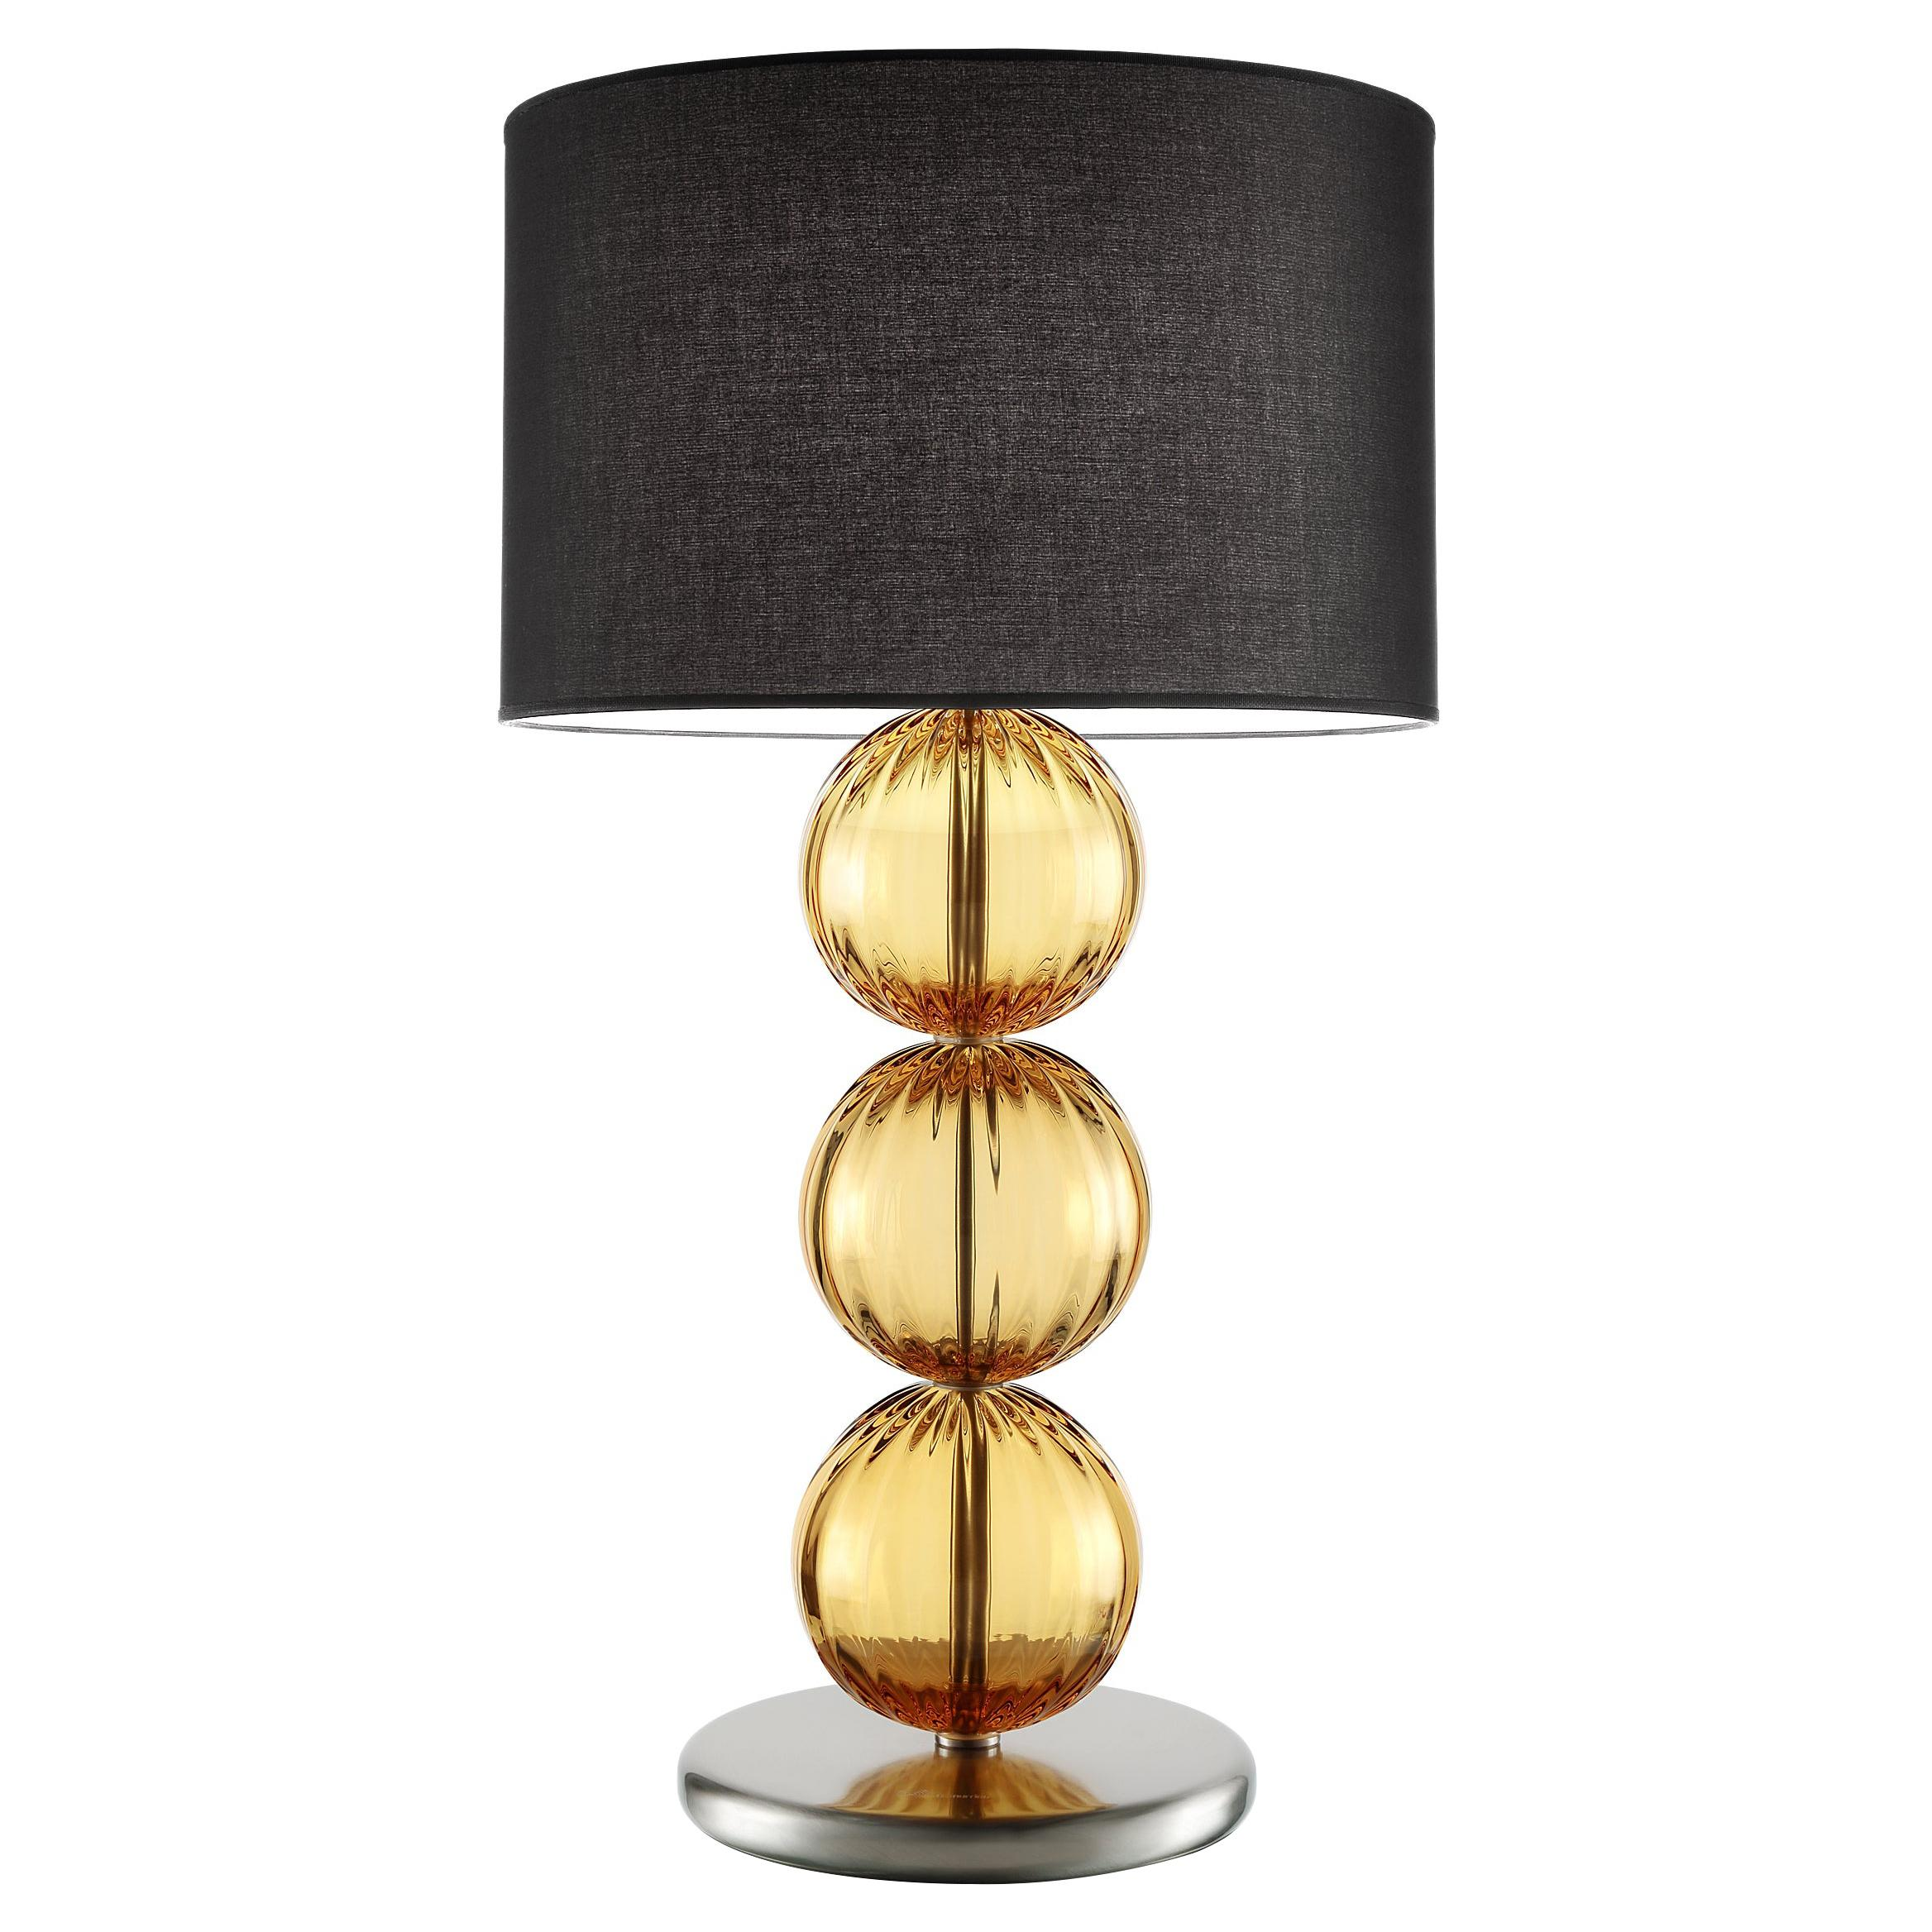 Artistic Handmade Table Lamp Rolls, by La Murrina